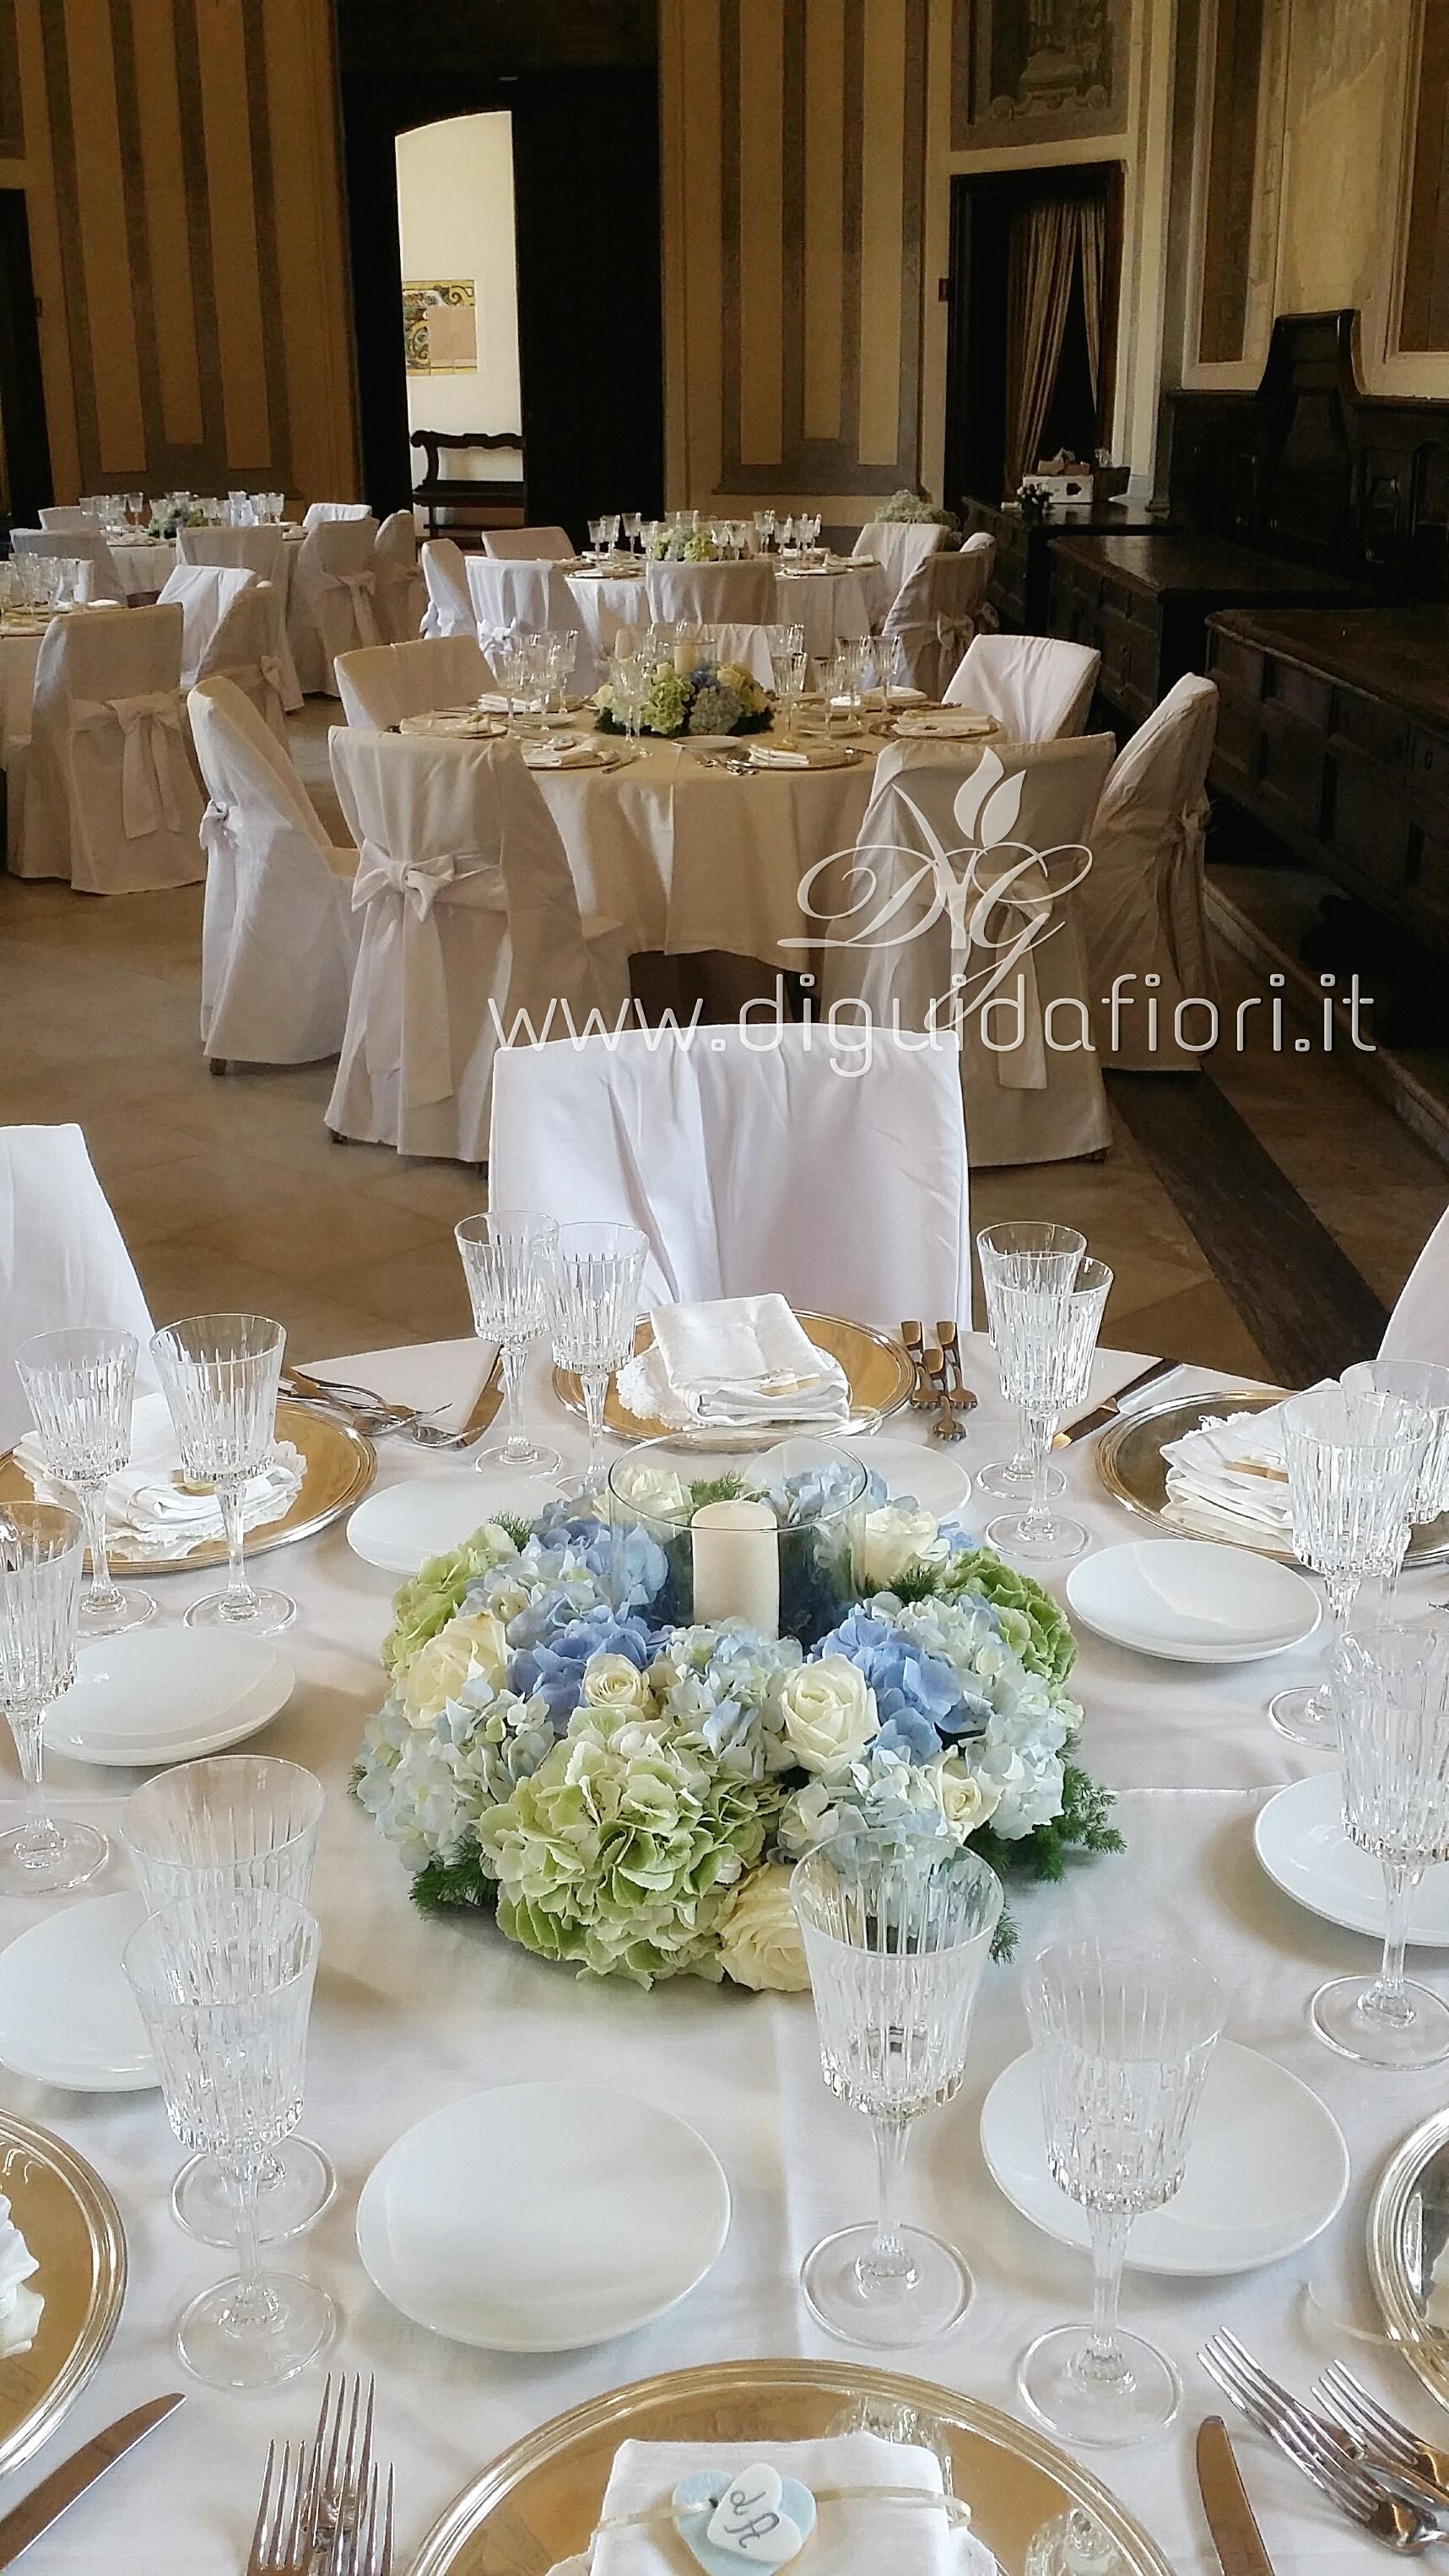 Centrotavola Matrimonio Azzurro : Centrotavola floreale per matrimonio chiostro di santa